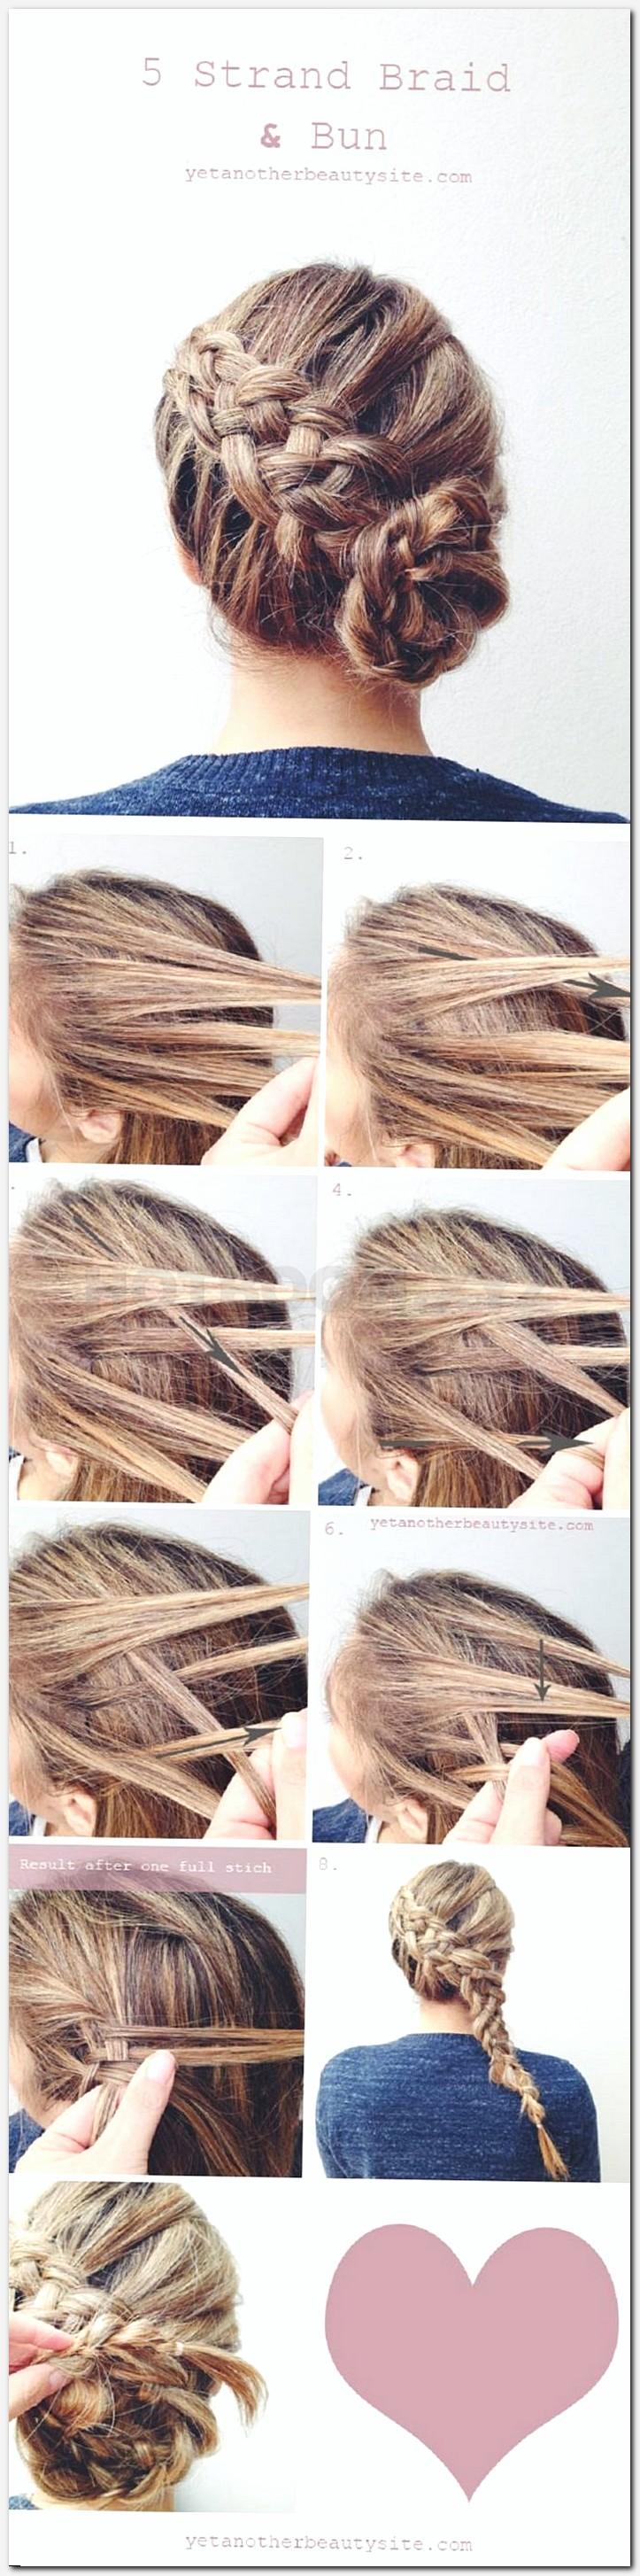 Mens haircut tutorials in hairstyles current short haircuts  hair setail layered